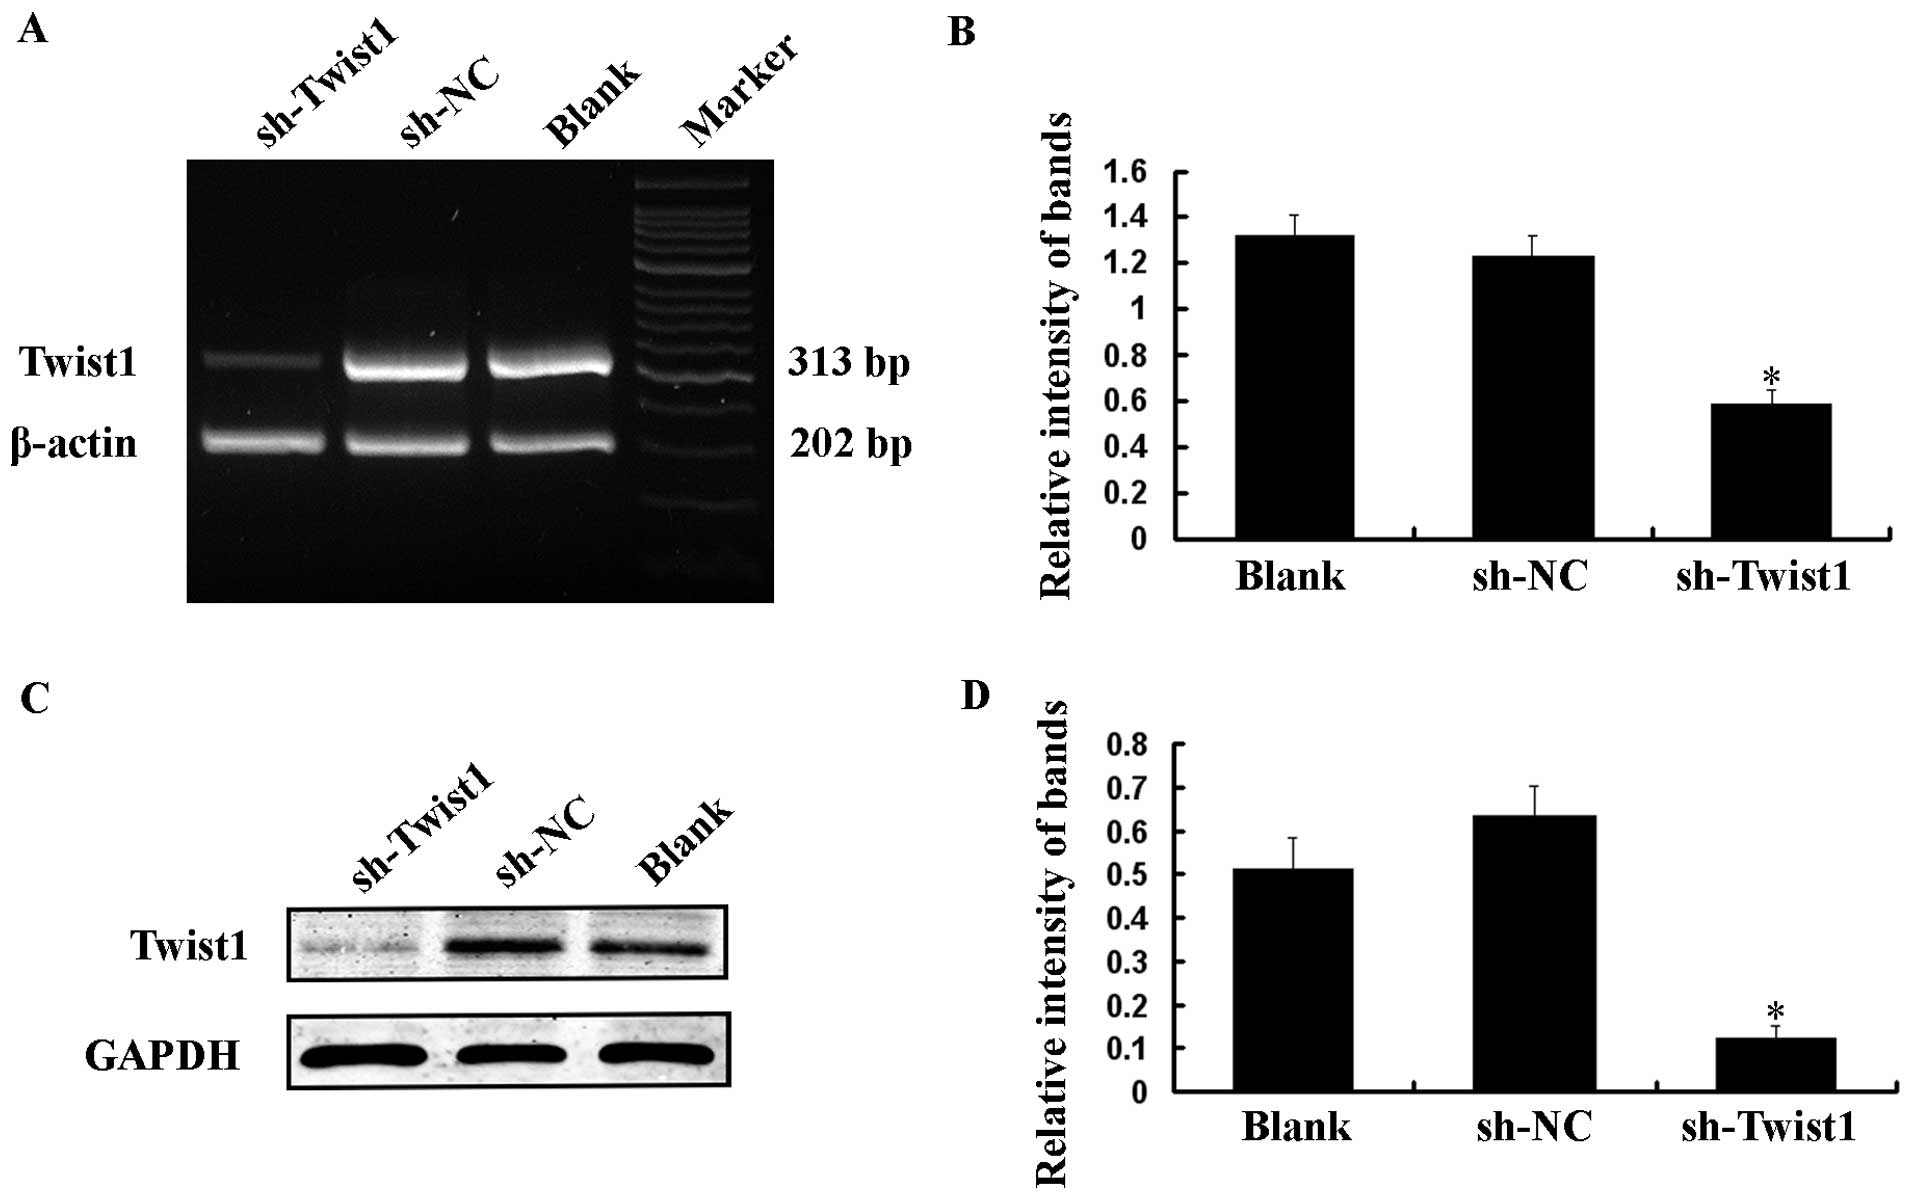 Short-hairpin RNA against aberrant HBBIVSI-110(G>A) mRNA